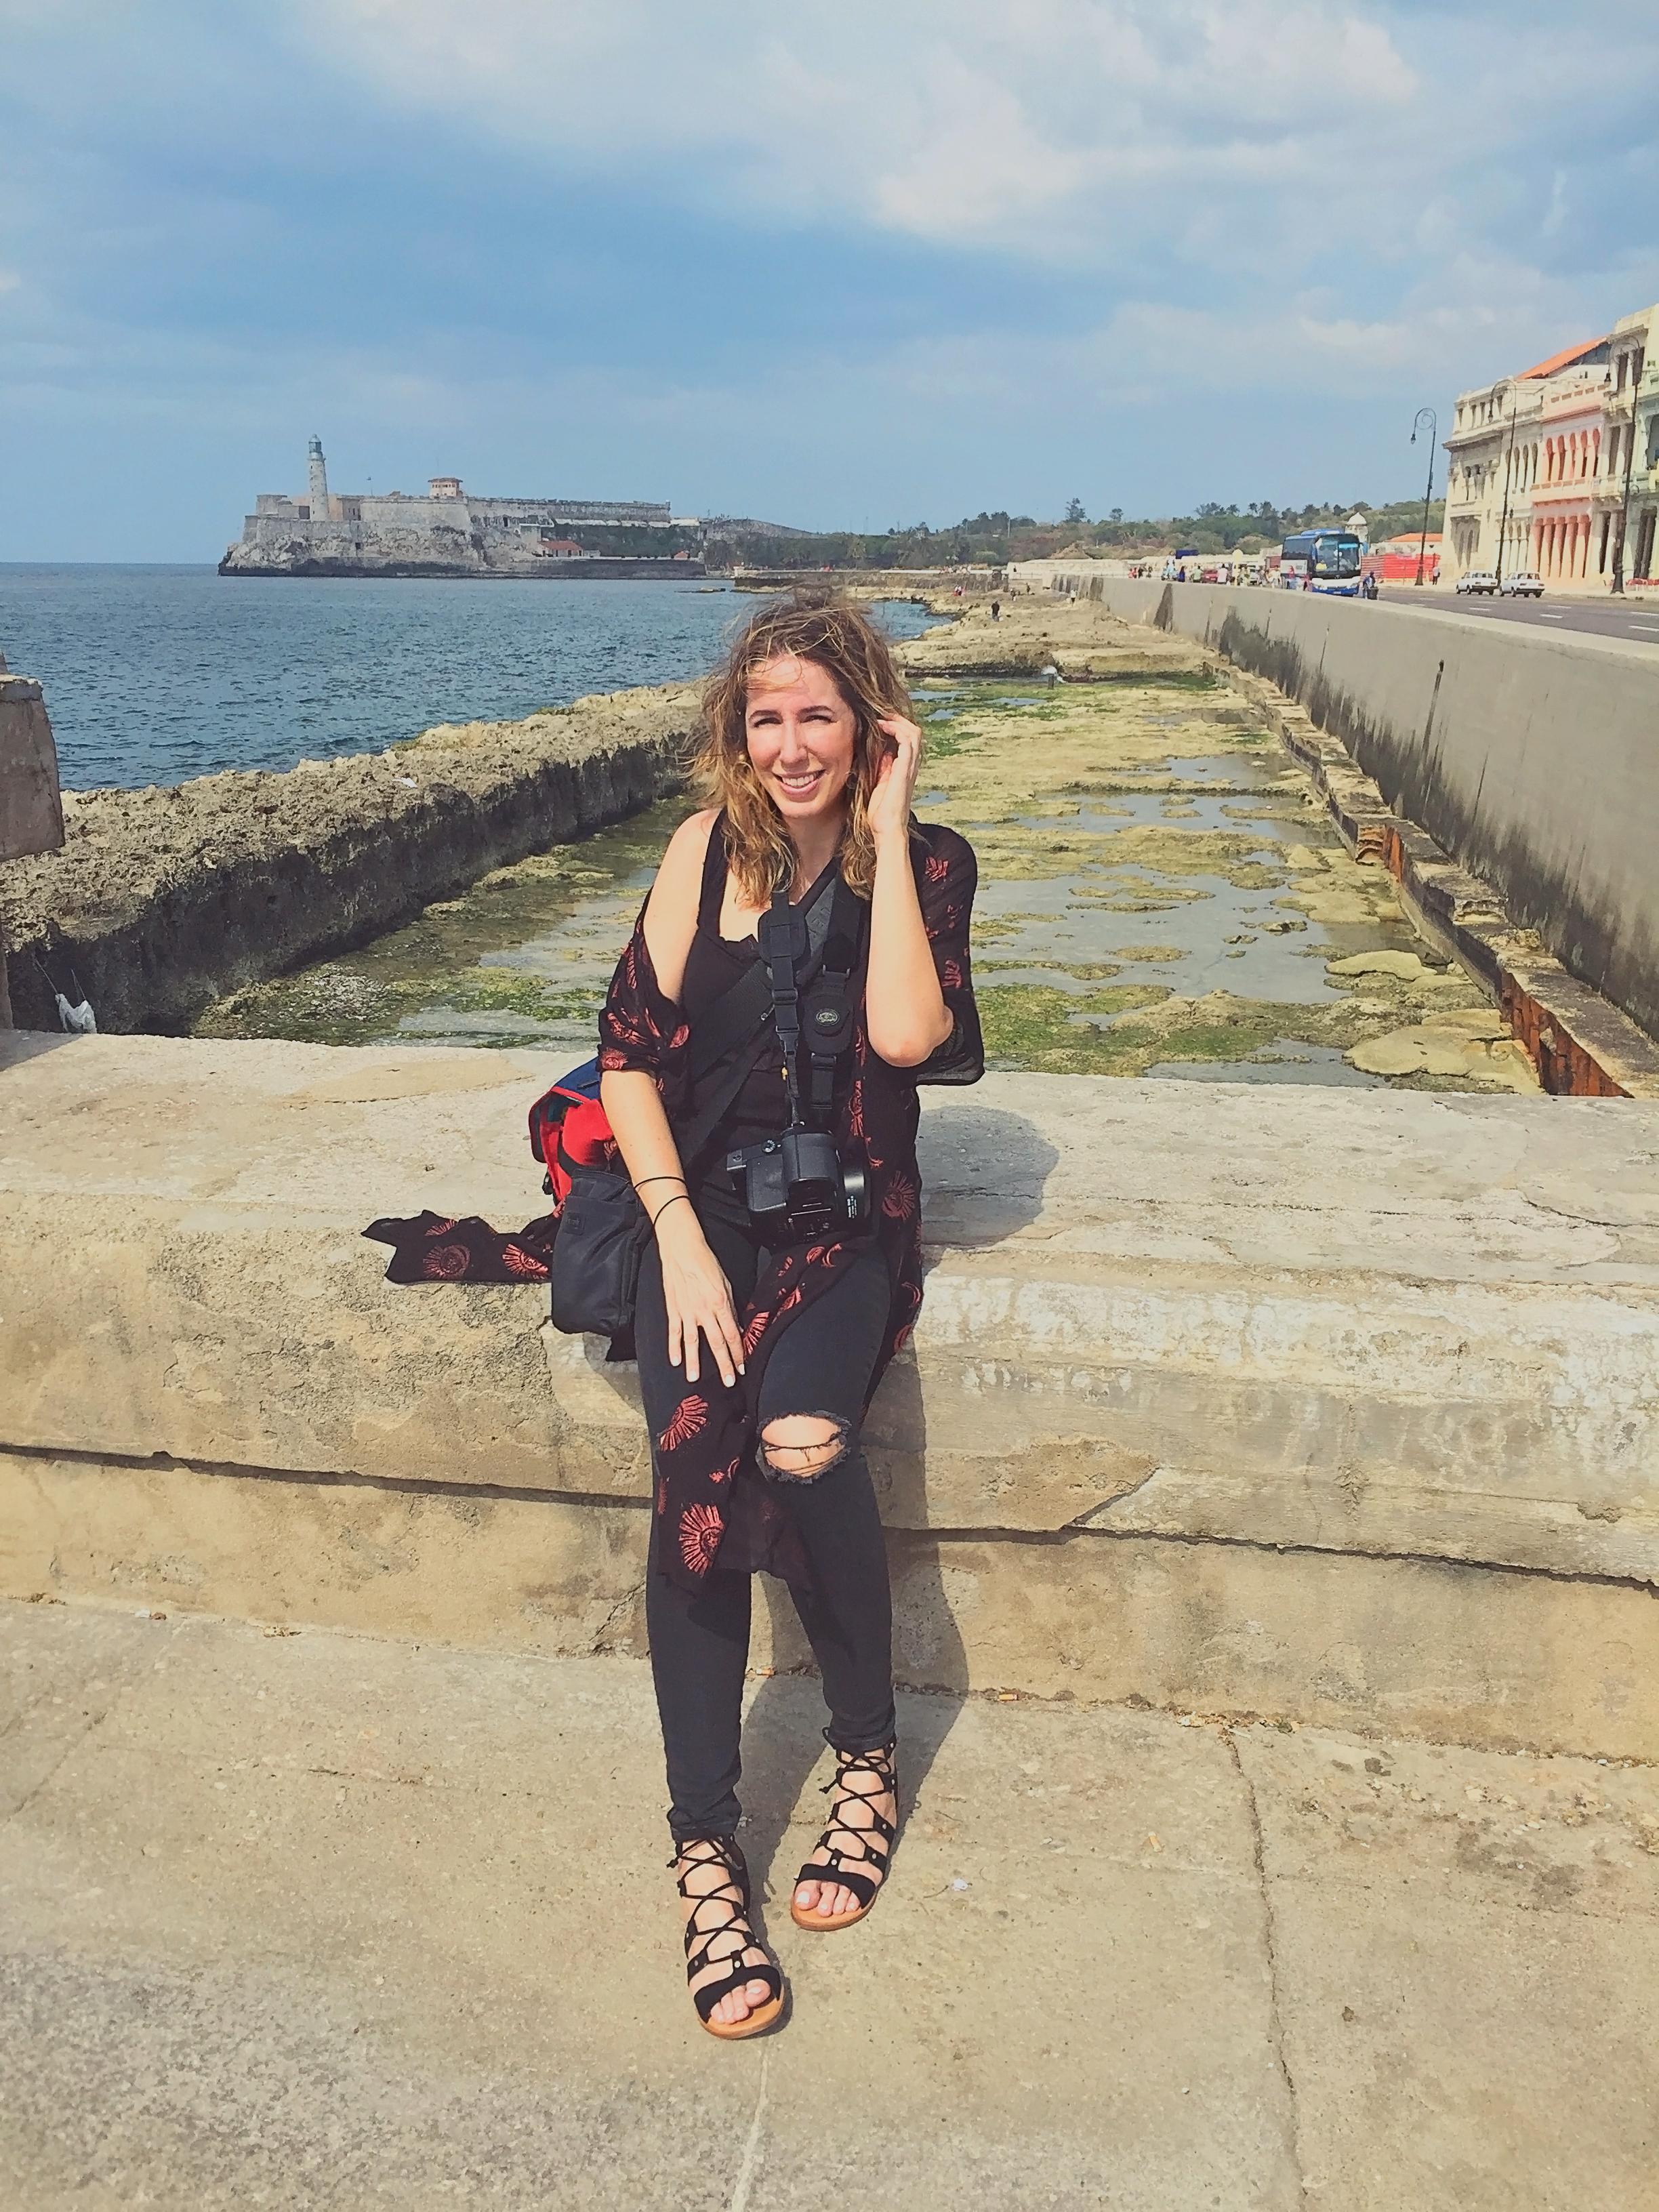 Sara Louise Petty at Malecon, Havana, Cuba.